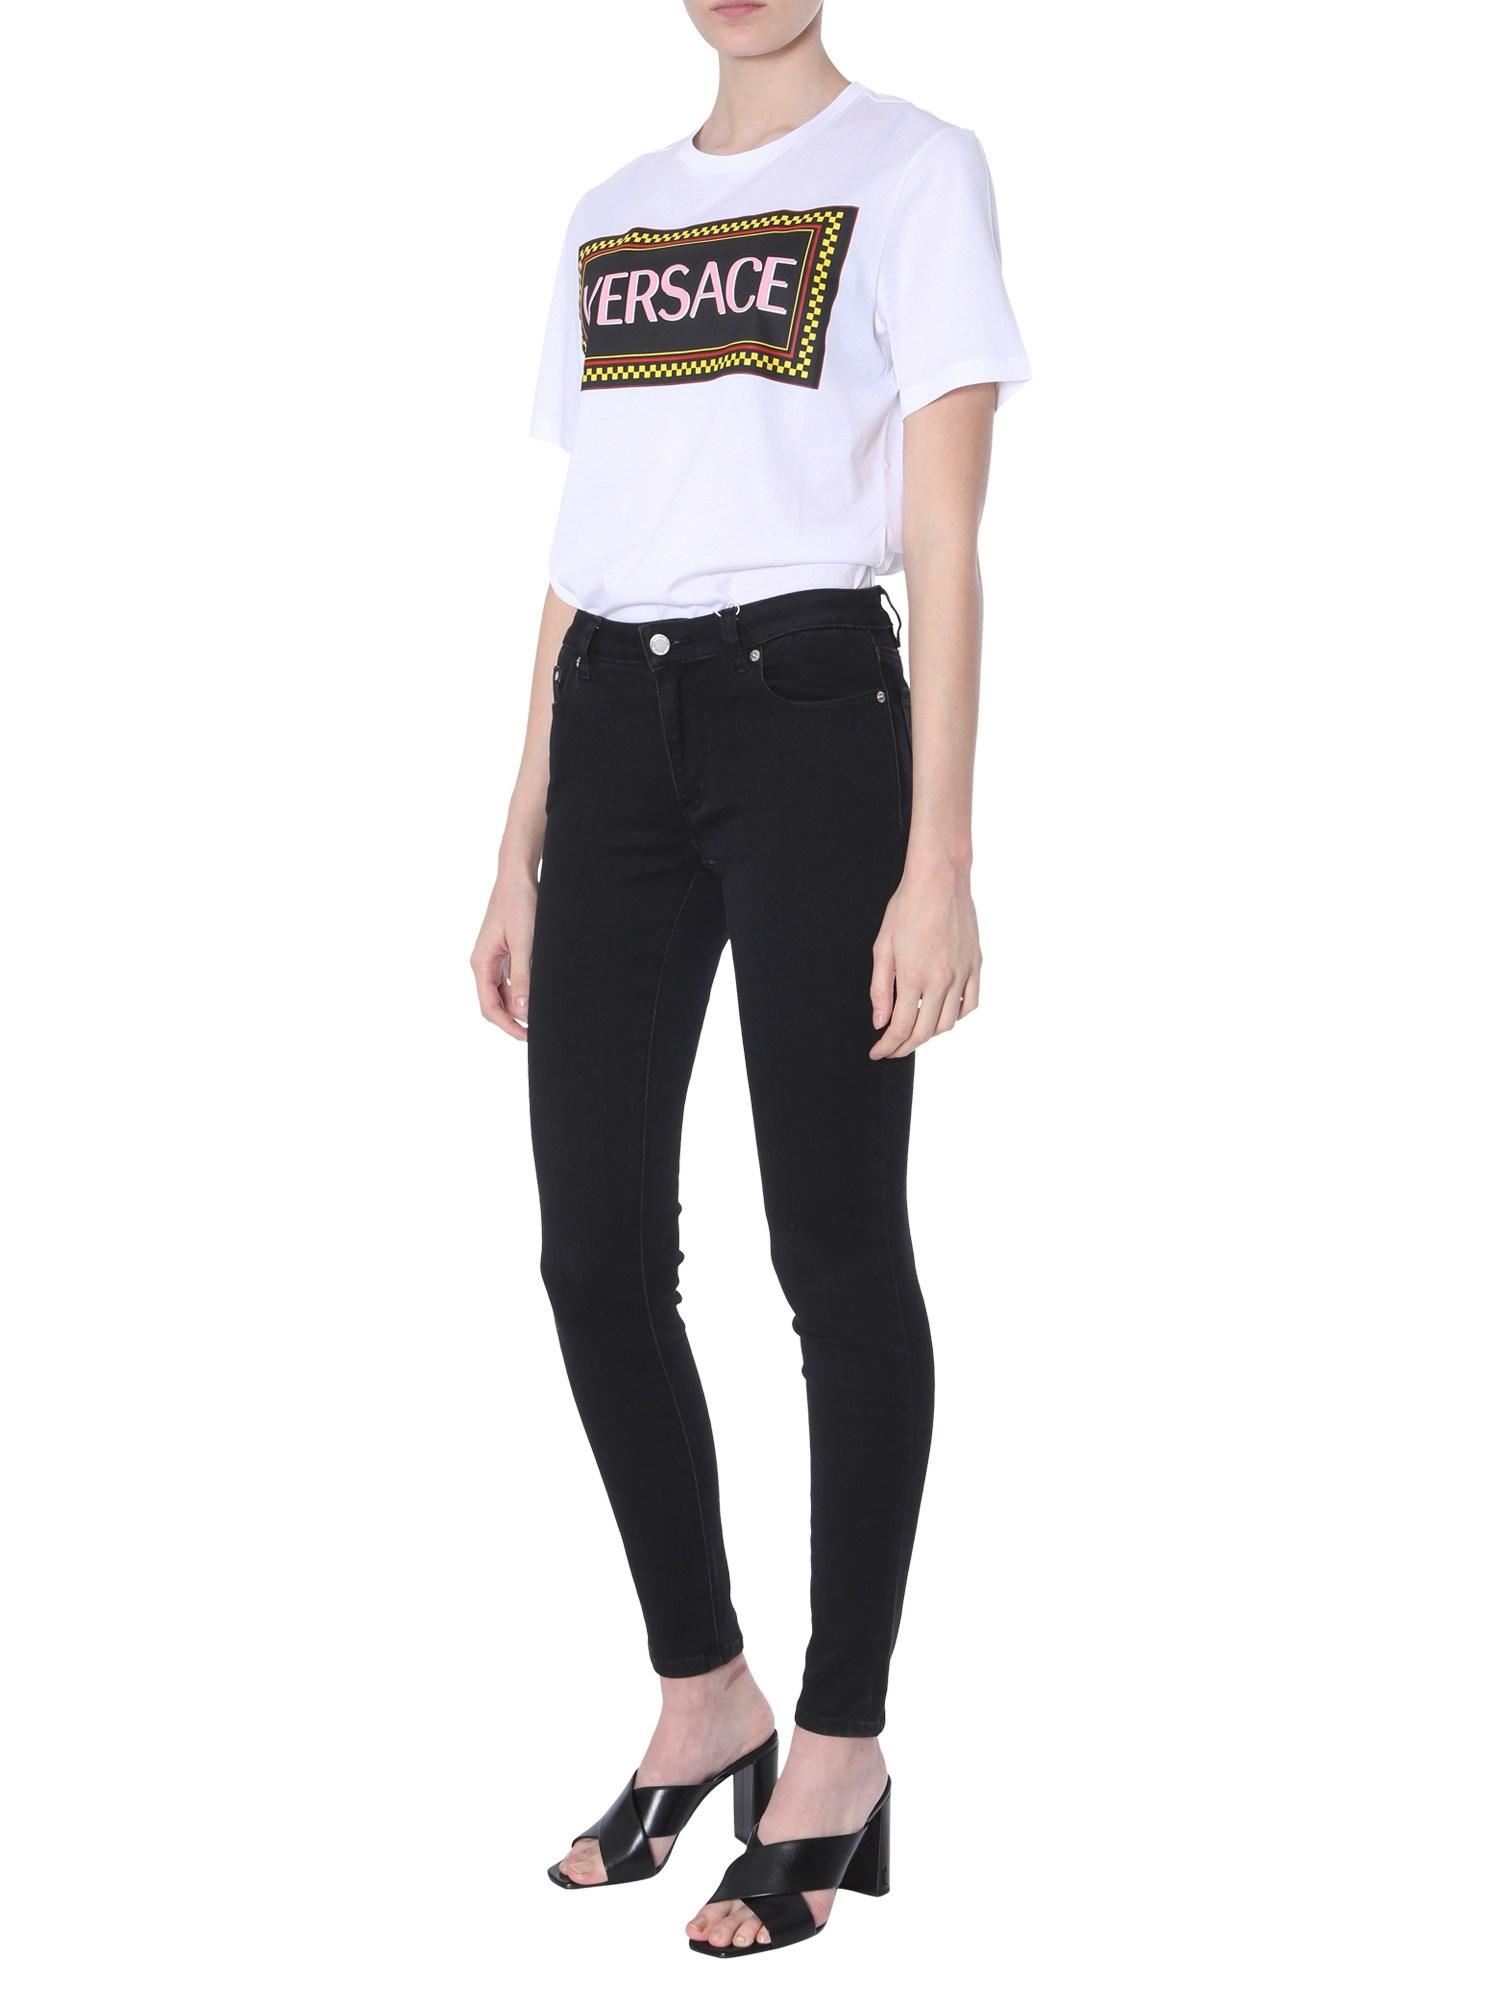 adc4b6bd Versace - White Cotton T-shirt With Wheeled Print 90s Vintage Logo - Lyst.  View fullscreen